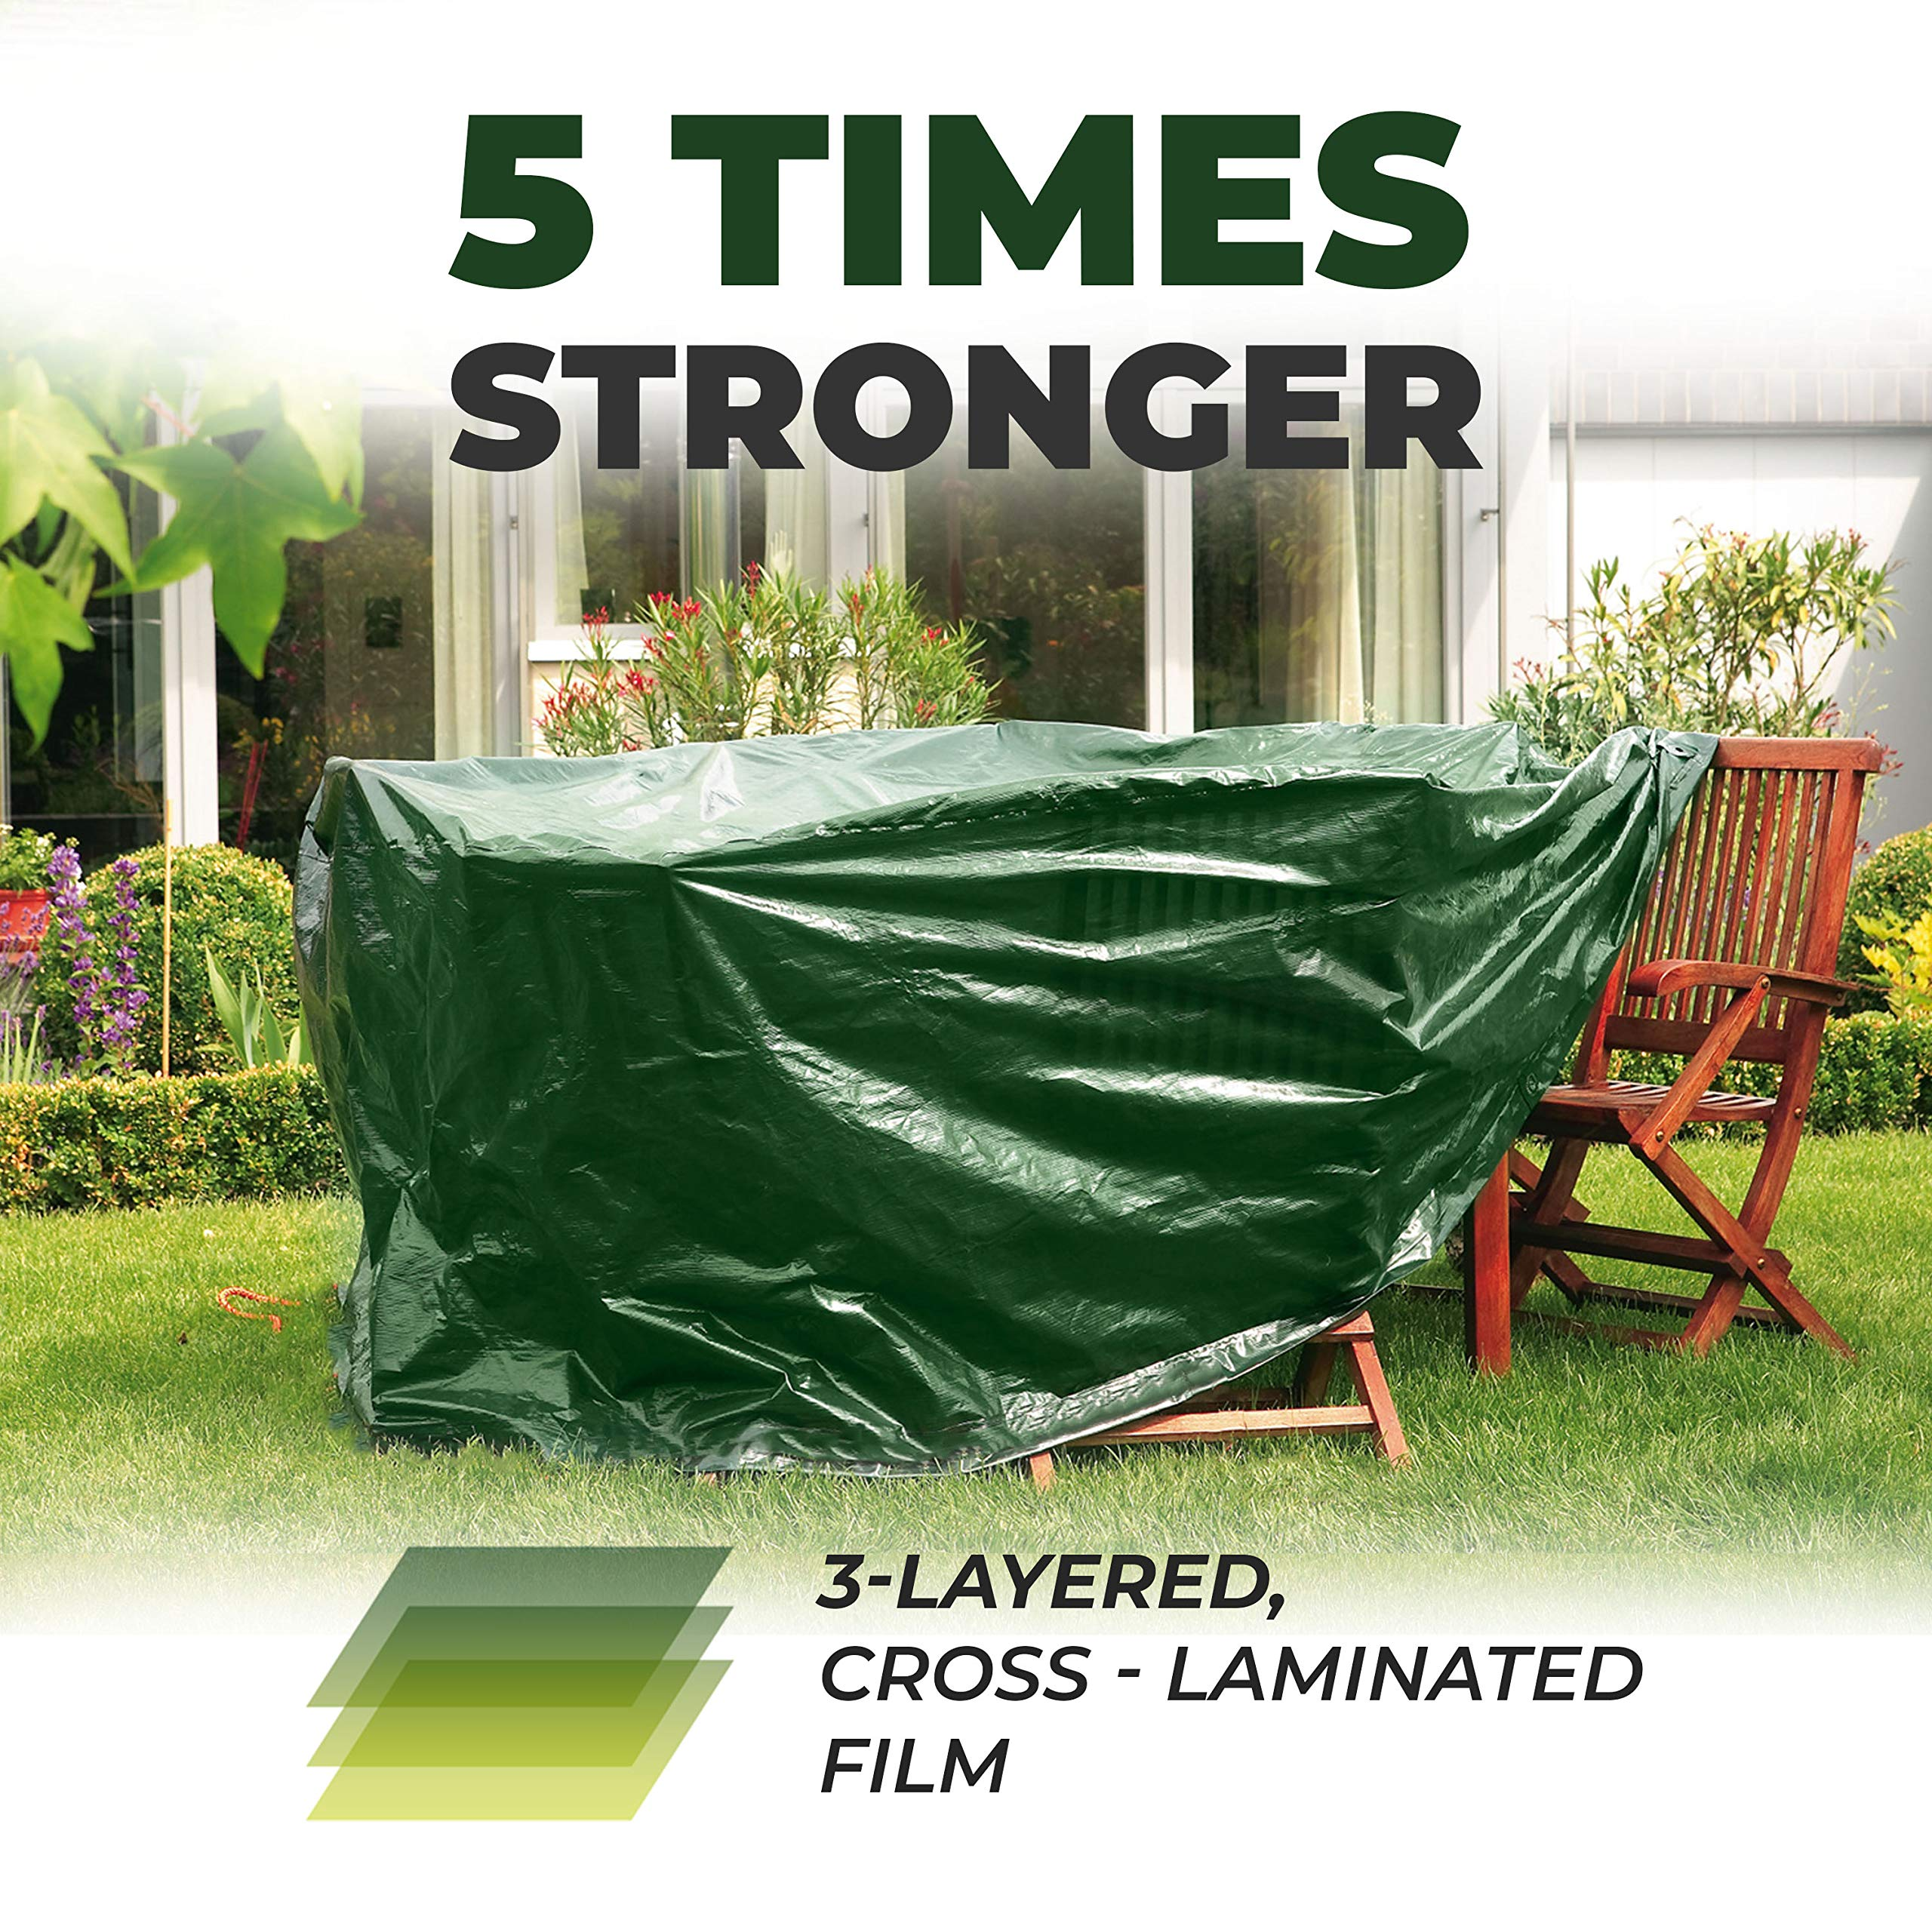 Bio Green RX-90-15x20-G Rainexo Waterproof Strong Tarp 90 GSM Cross Laminated, 15x20, Green by Bio Green